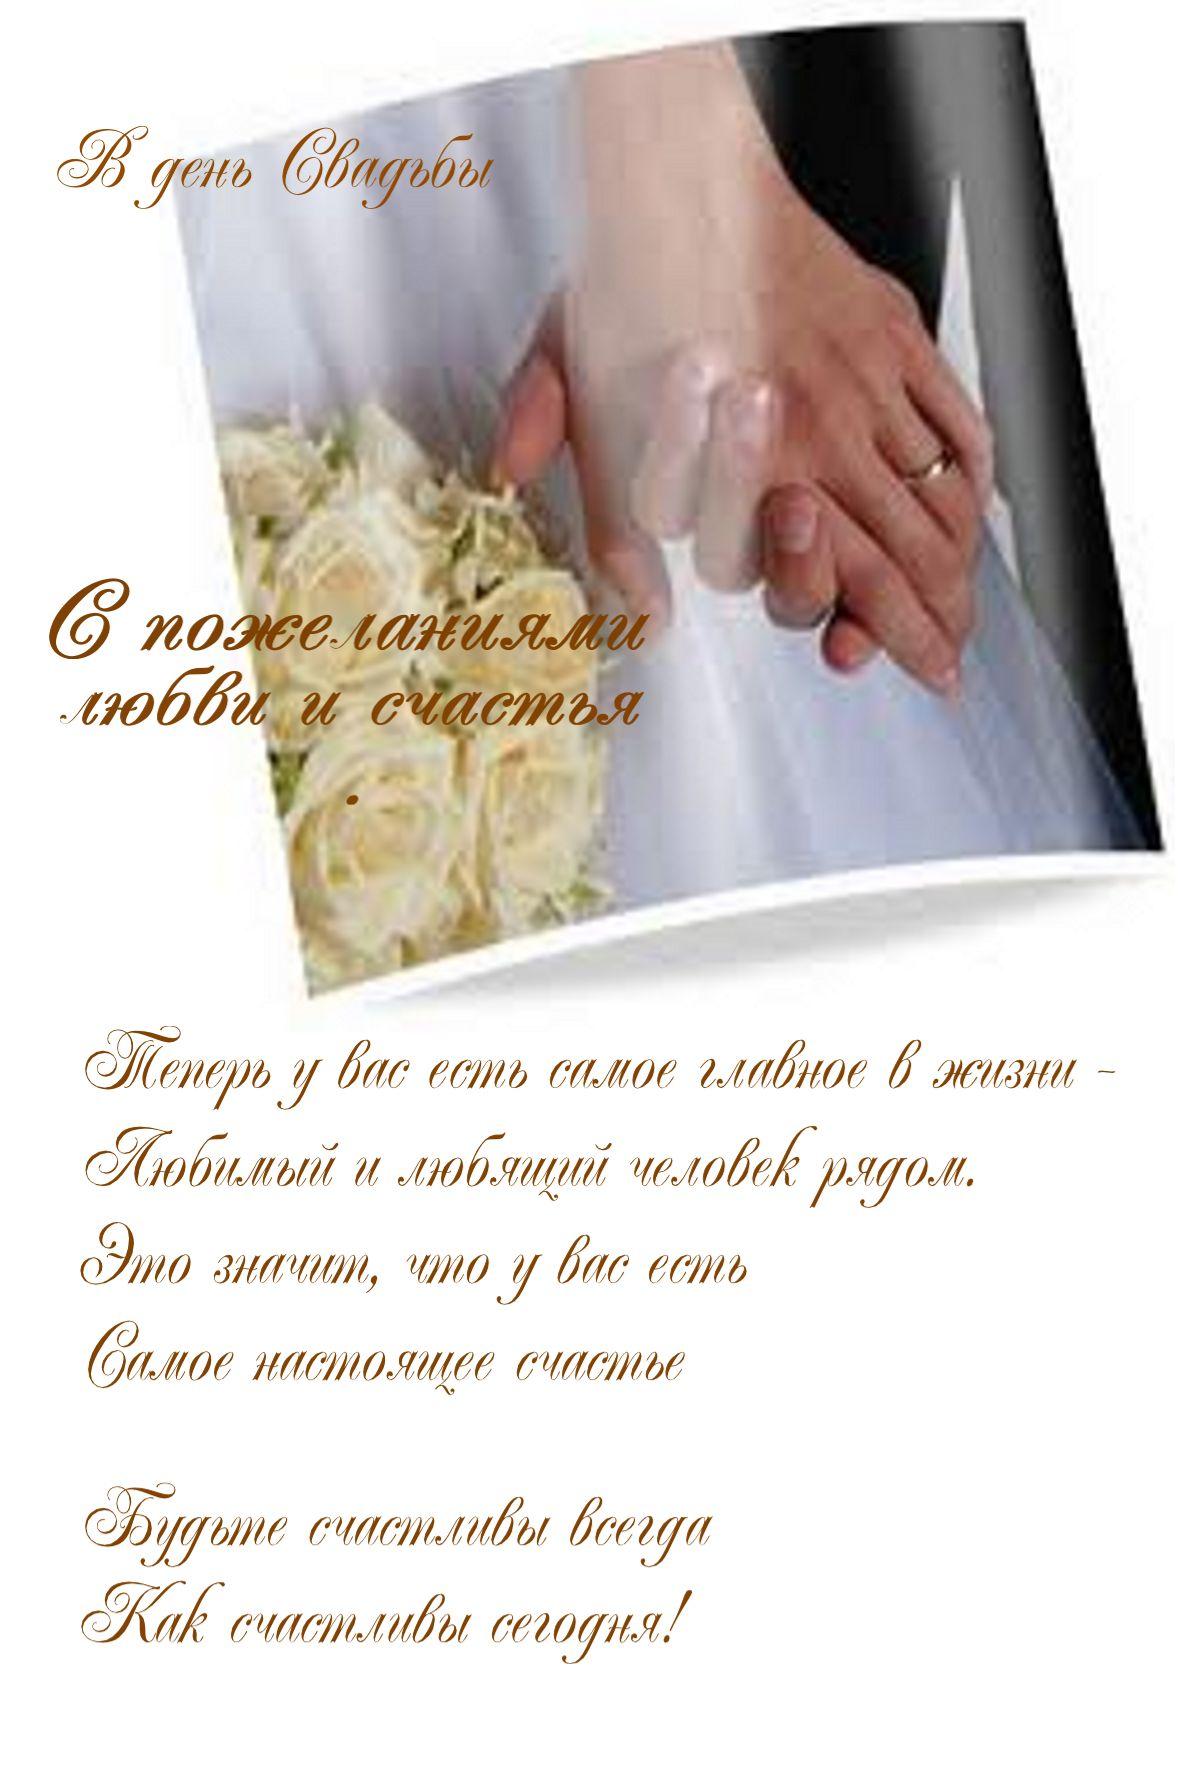 Поздравления на свадьбу отца и матери